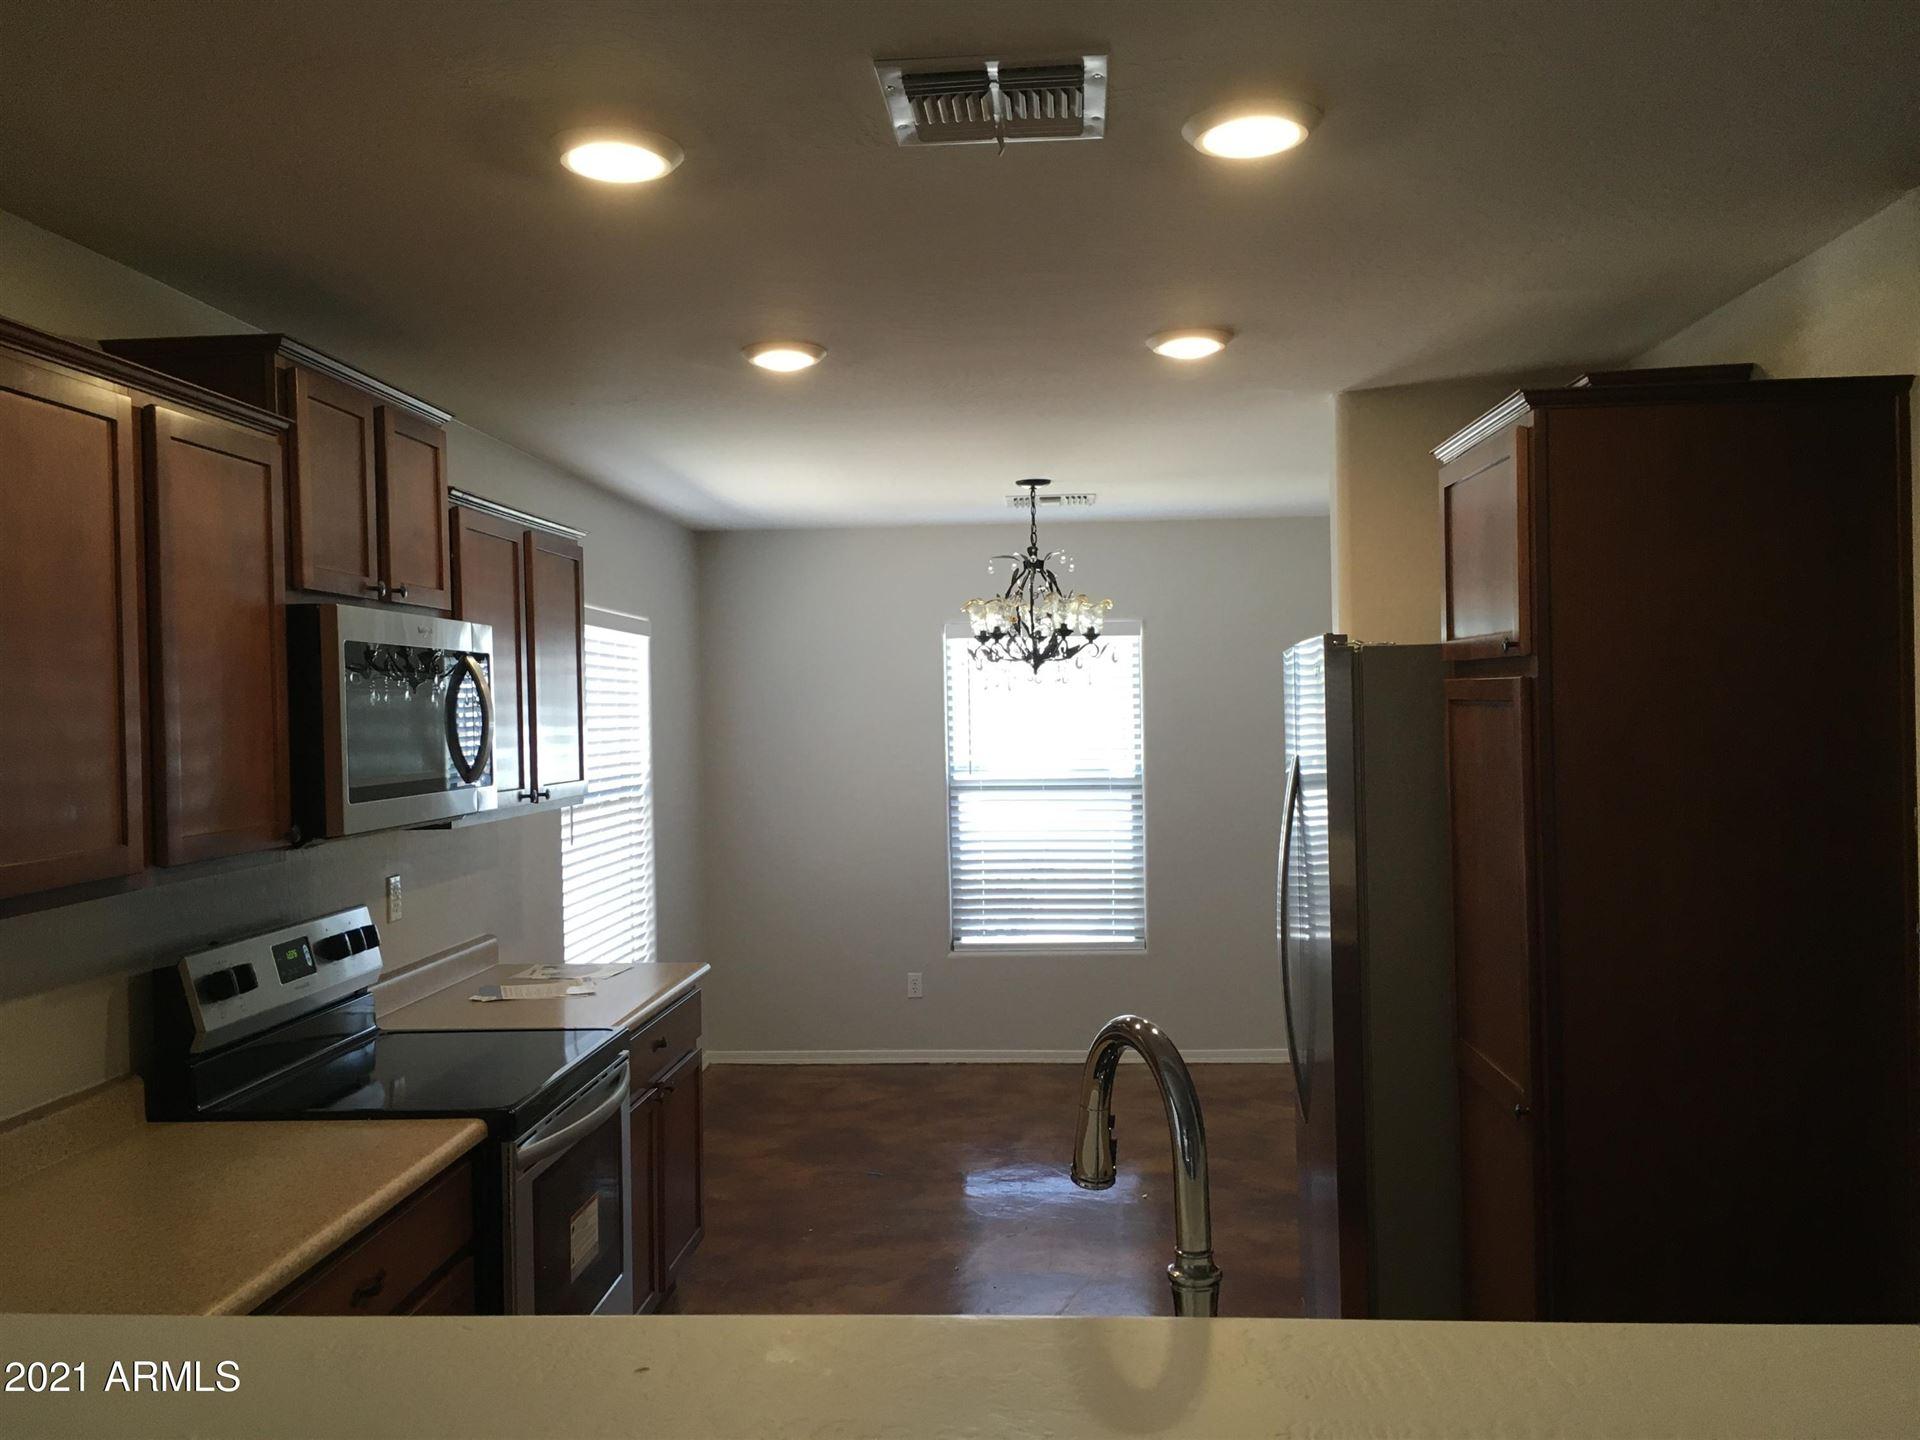 Photo of 43683 W ARIZONA Avenue, Maricopa, AZ 85138 (MLS # 6232344)